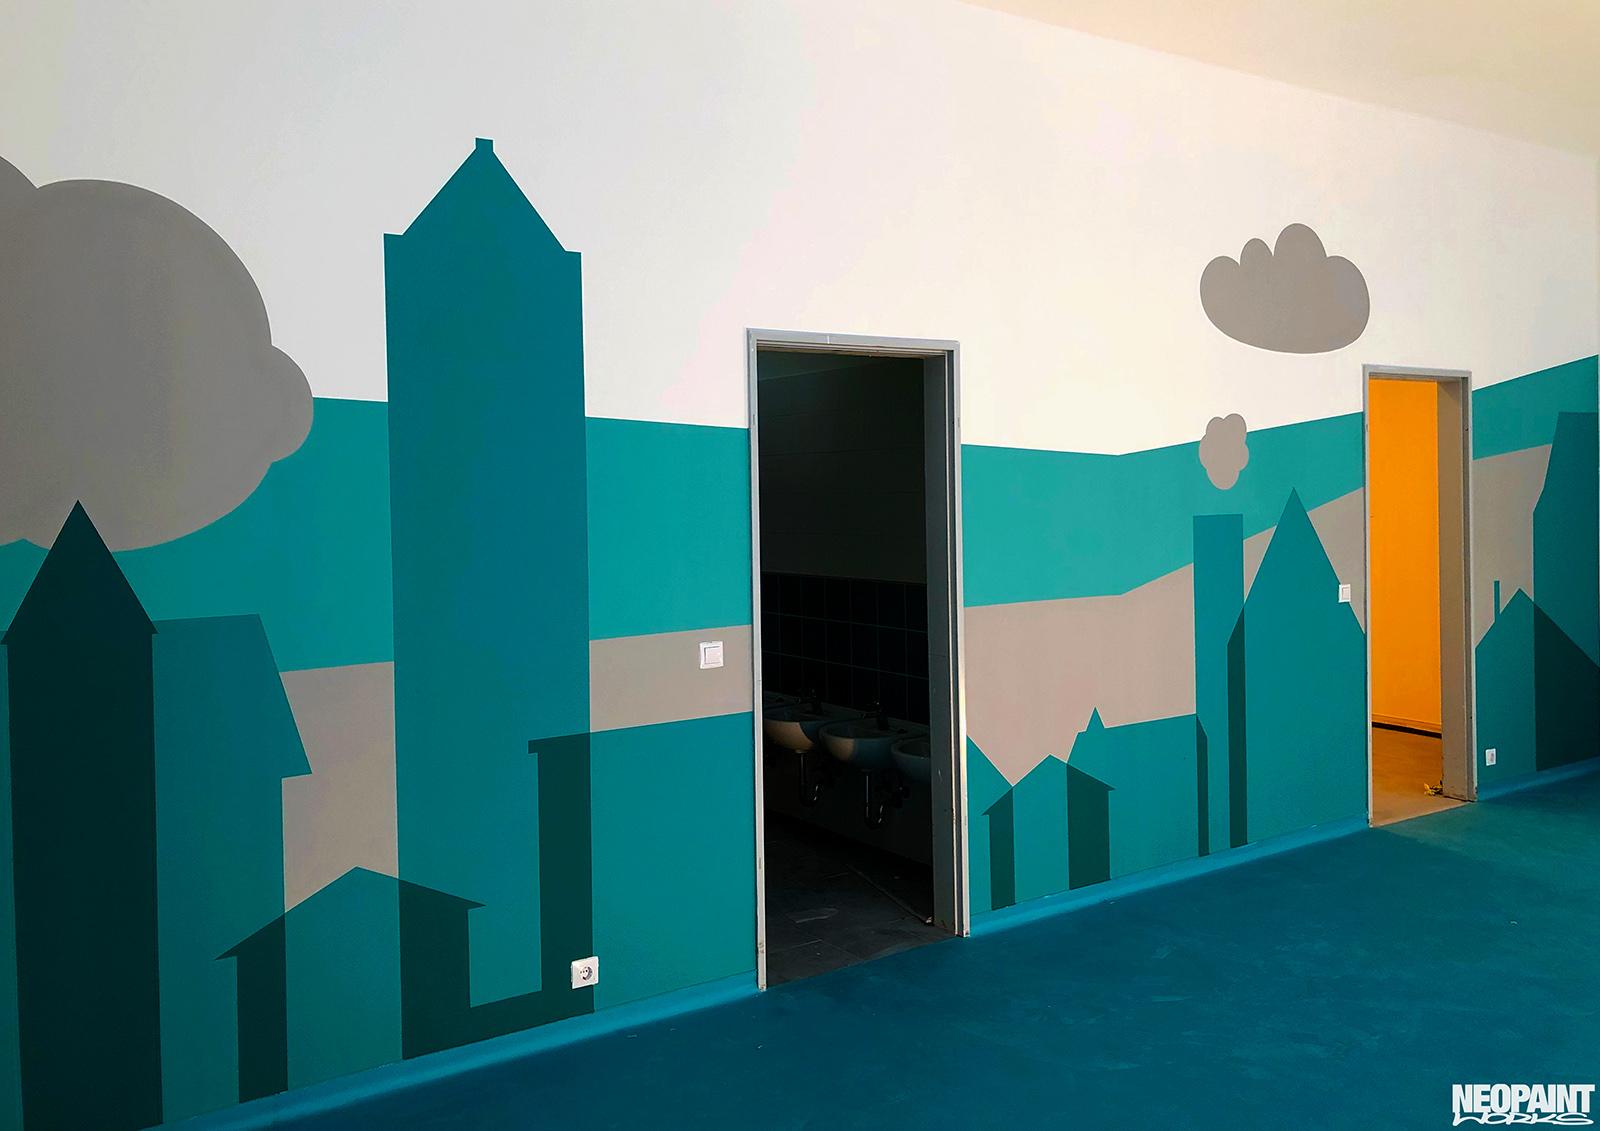 óvodai falfestmény - faldekor - neopaint works